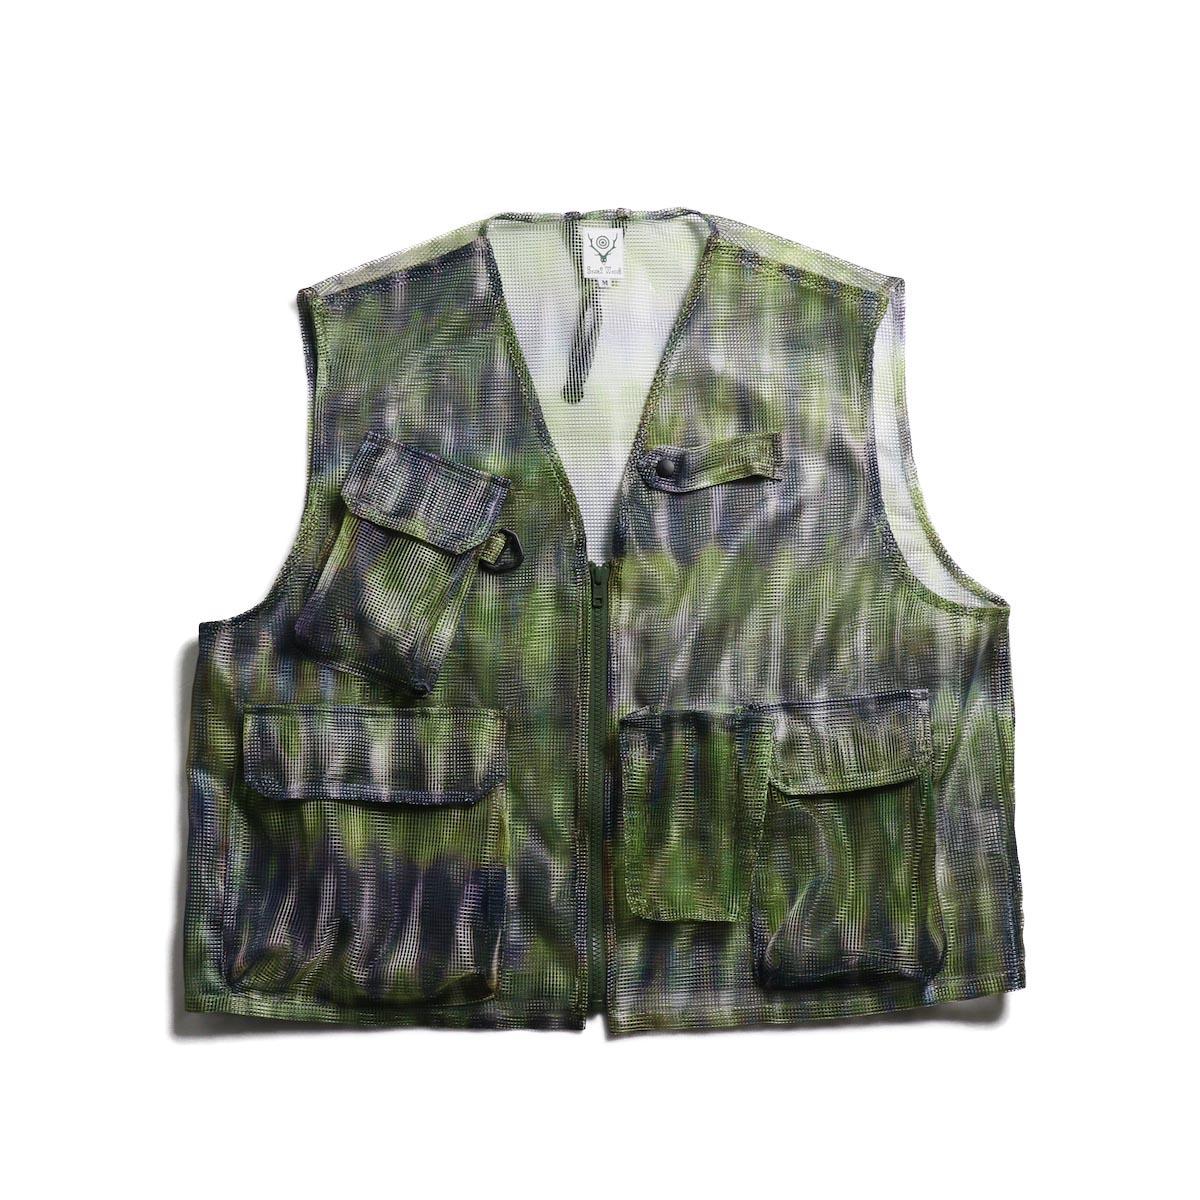 SOUTH2 WEST8 / Mesh Bush Vest -Poly Mesh (Tie Dye)